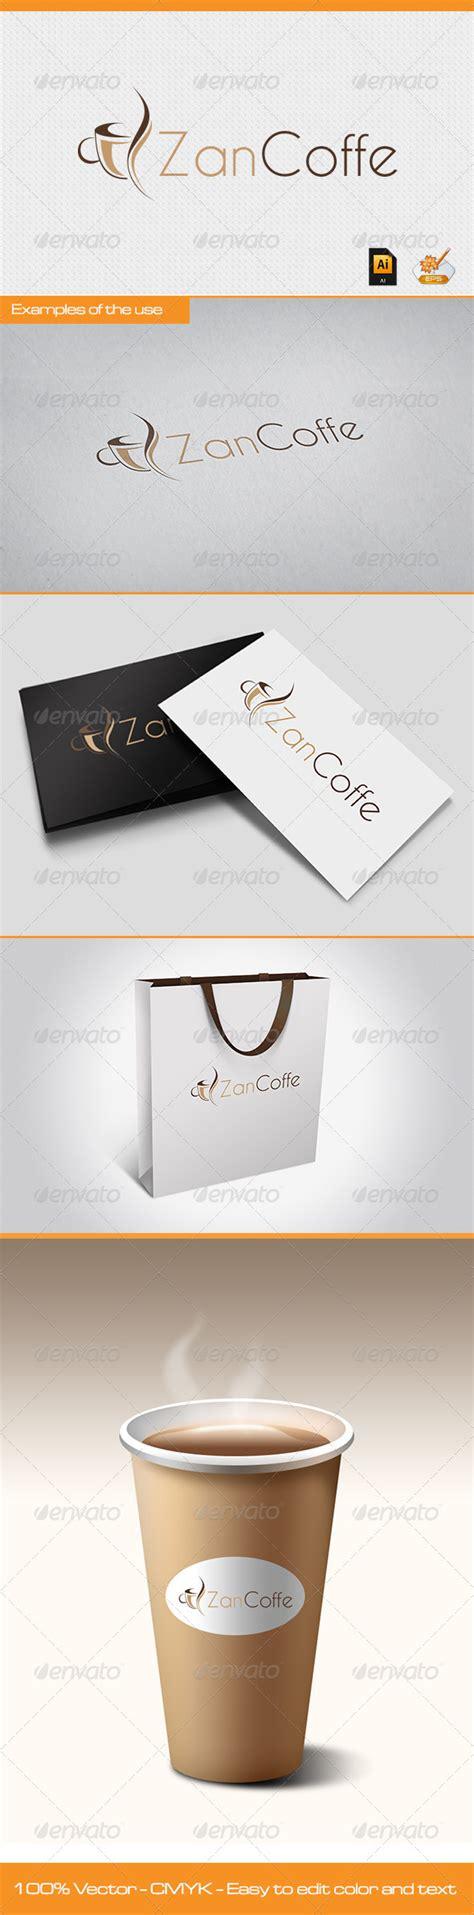 warez coffe store template 187 maydesk com